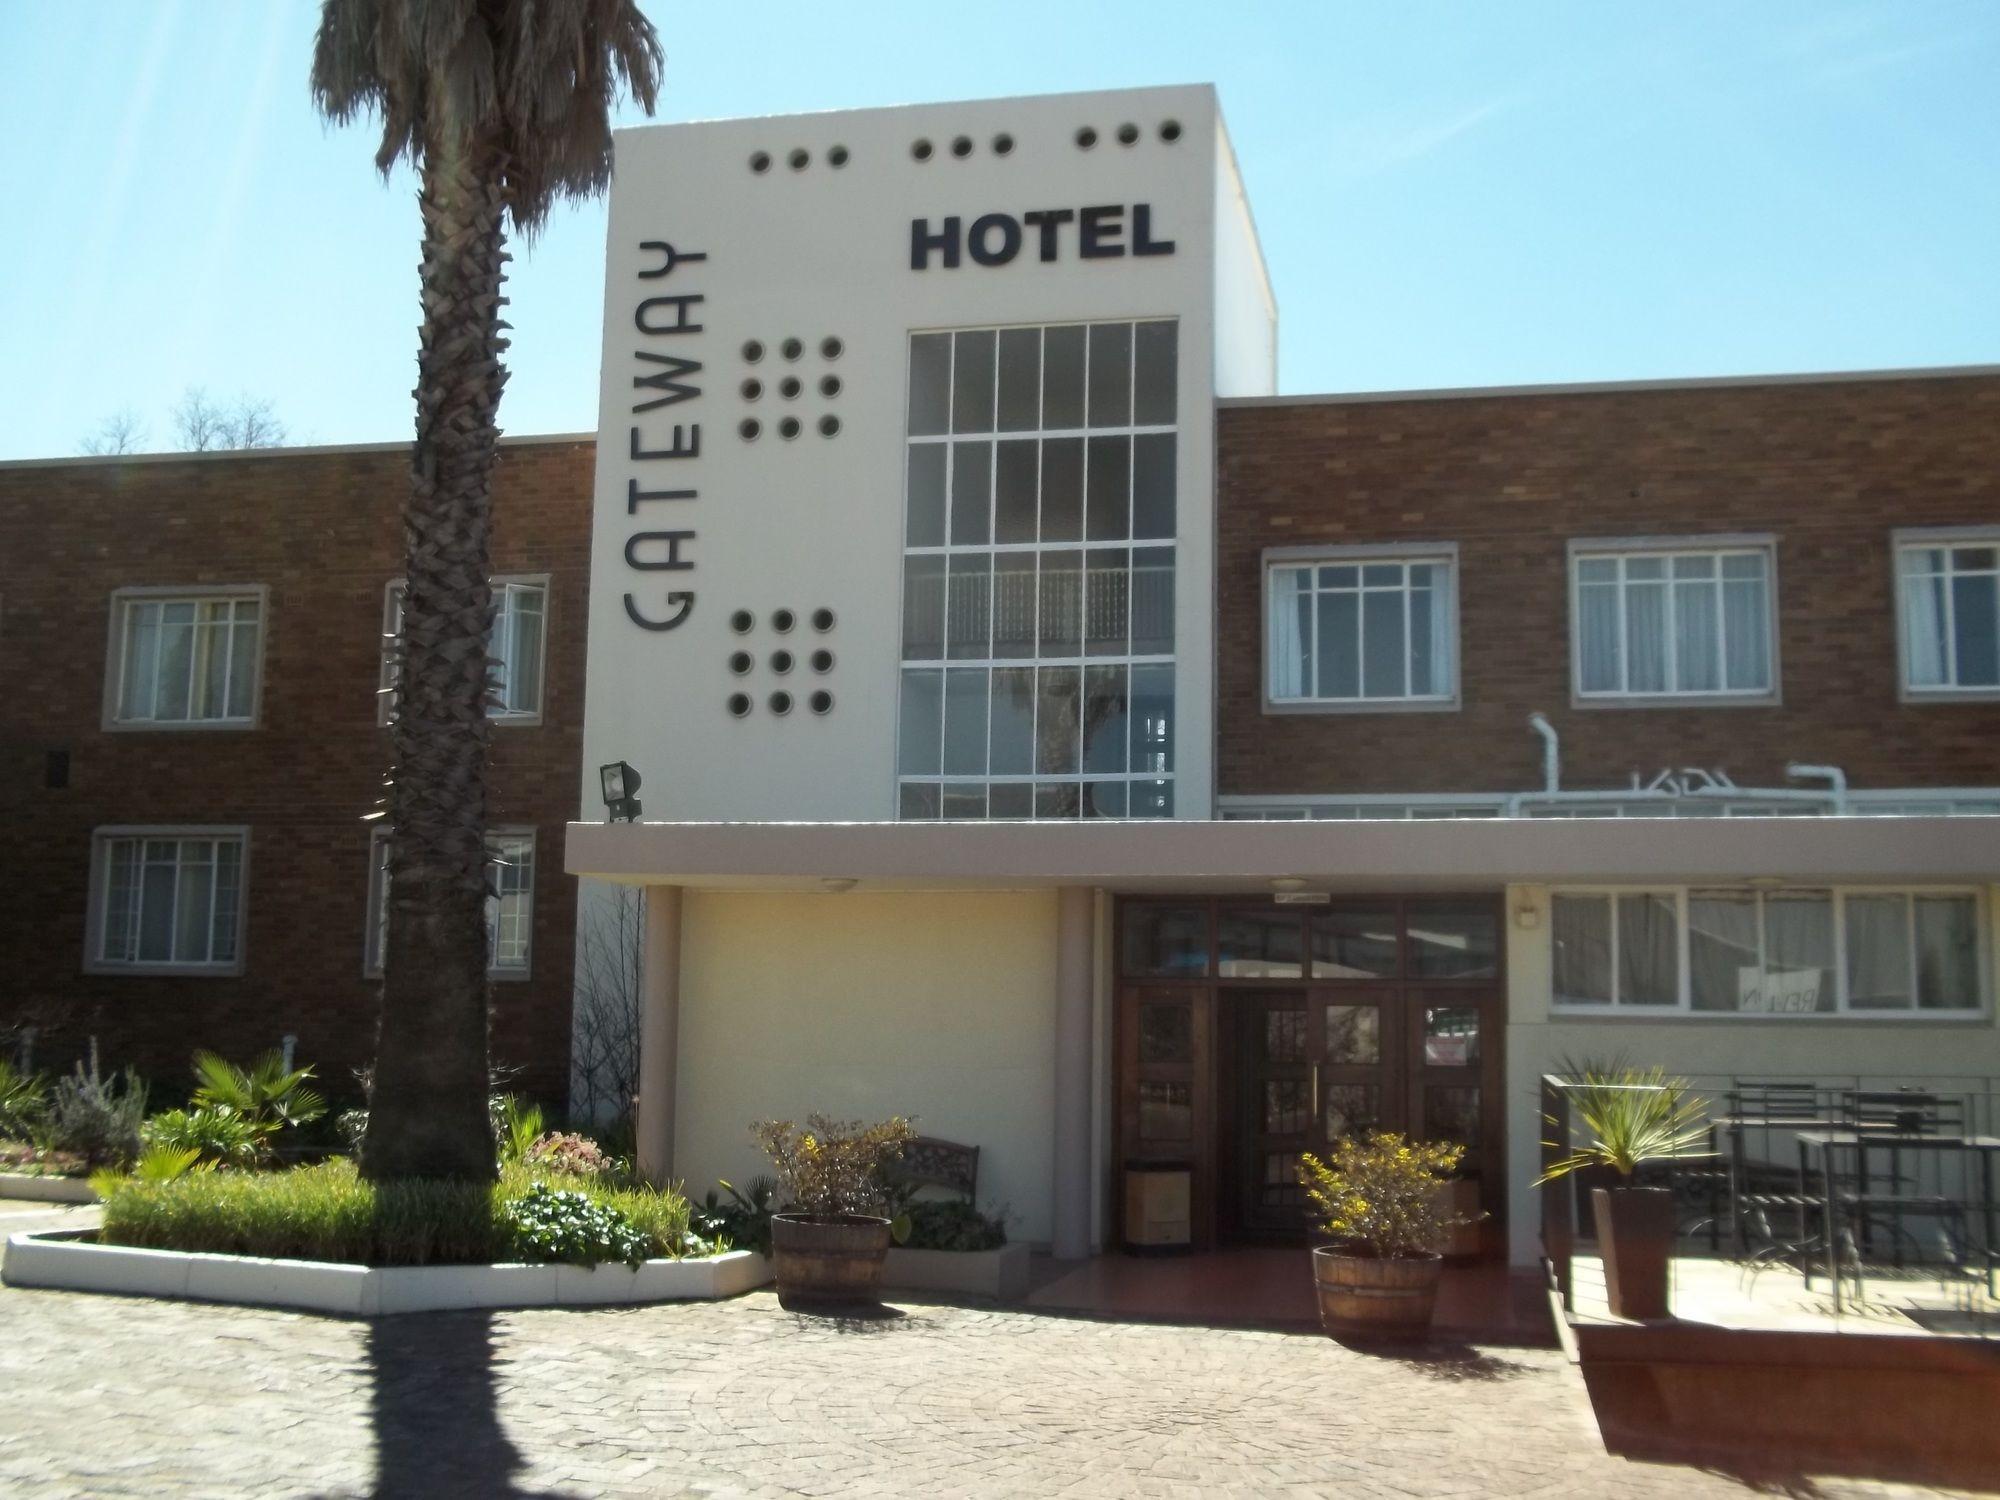 The Gateway Hotel